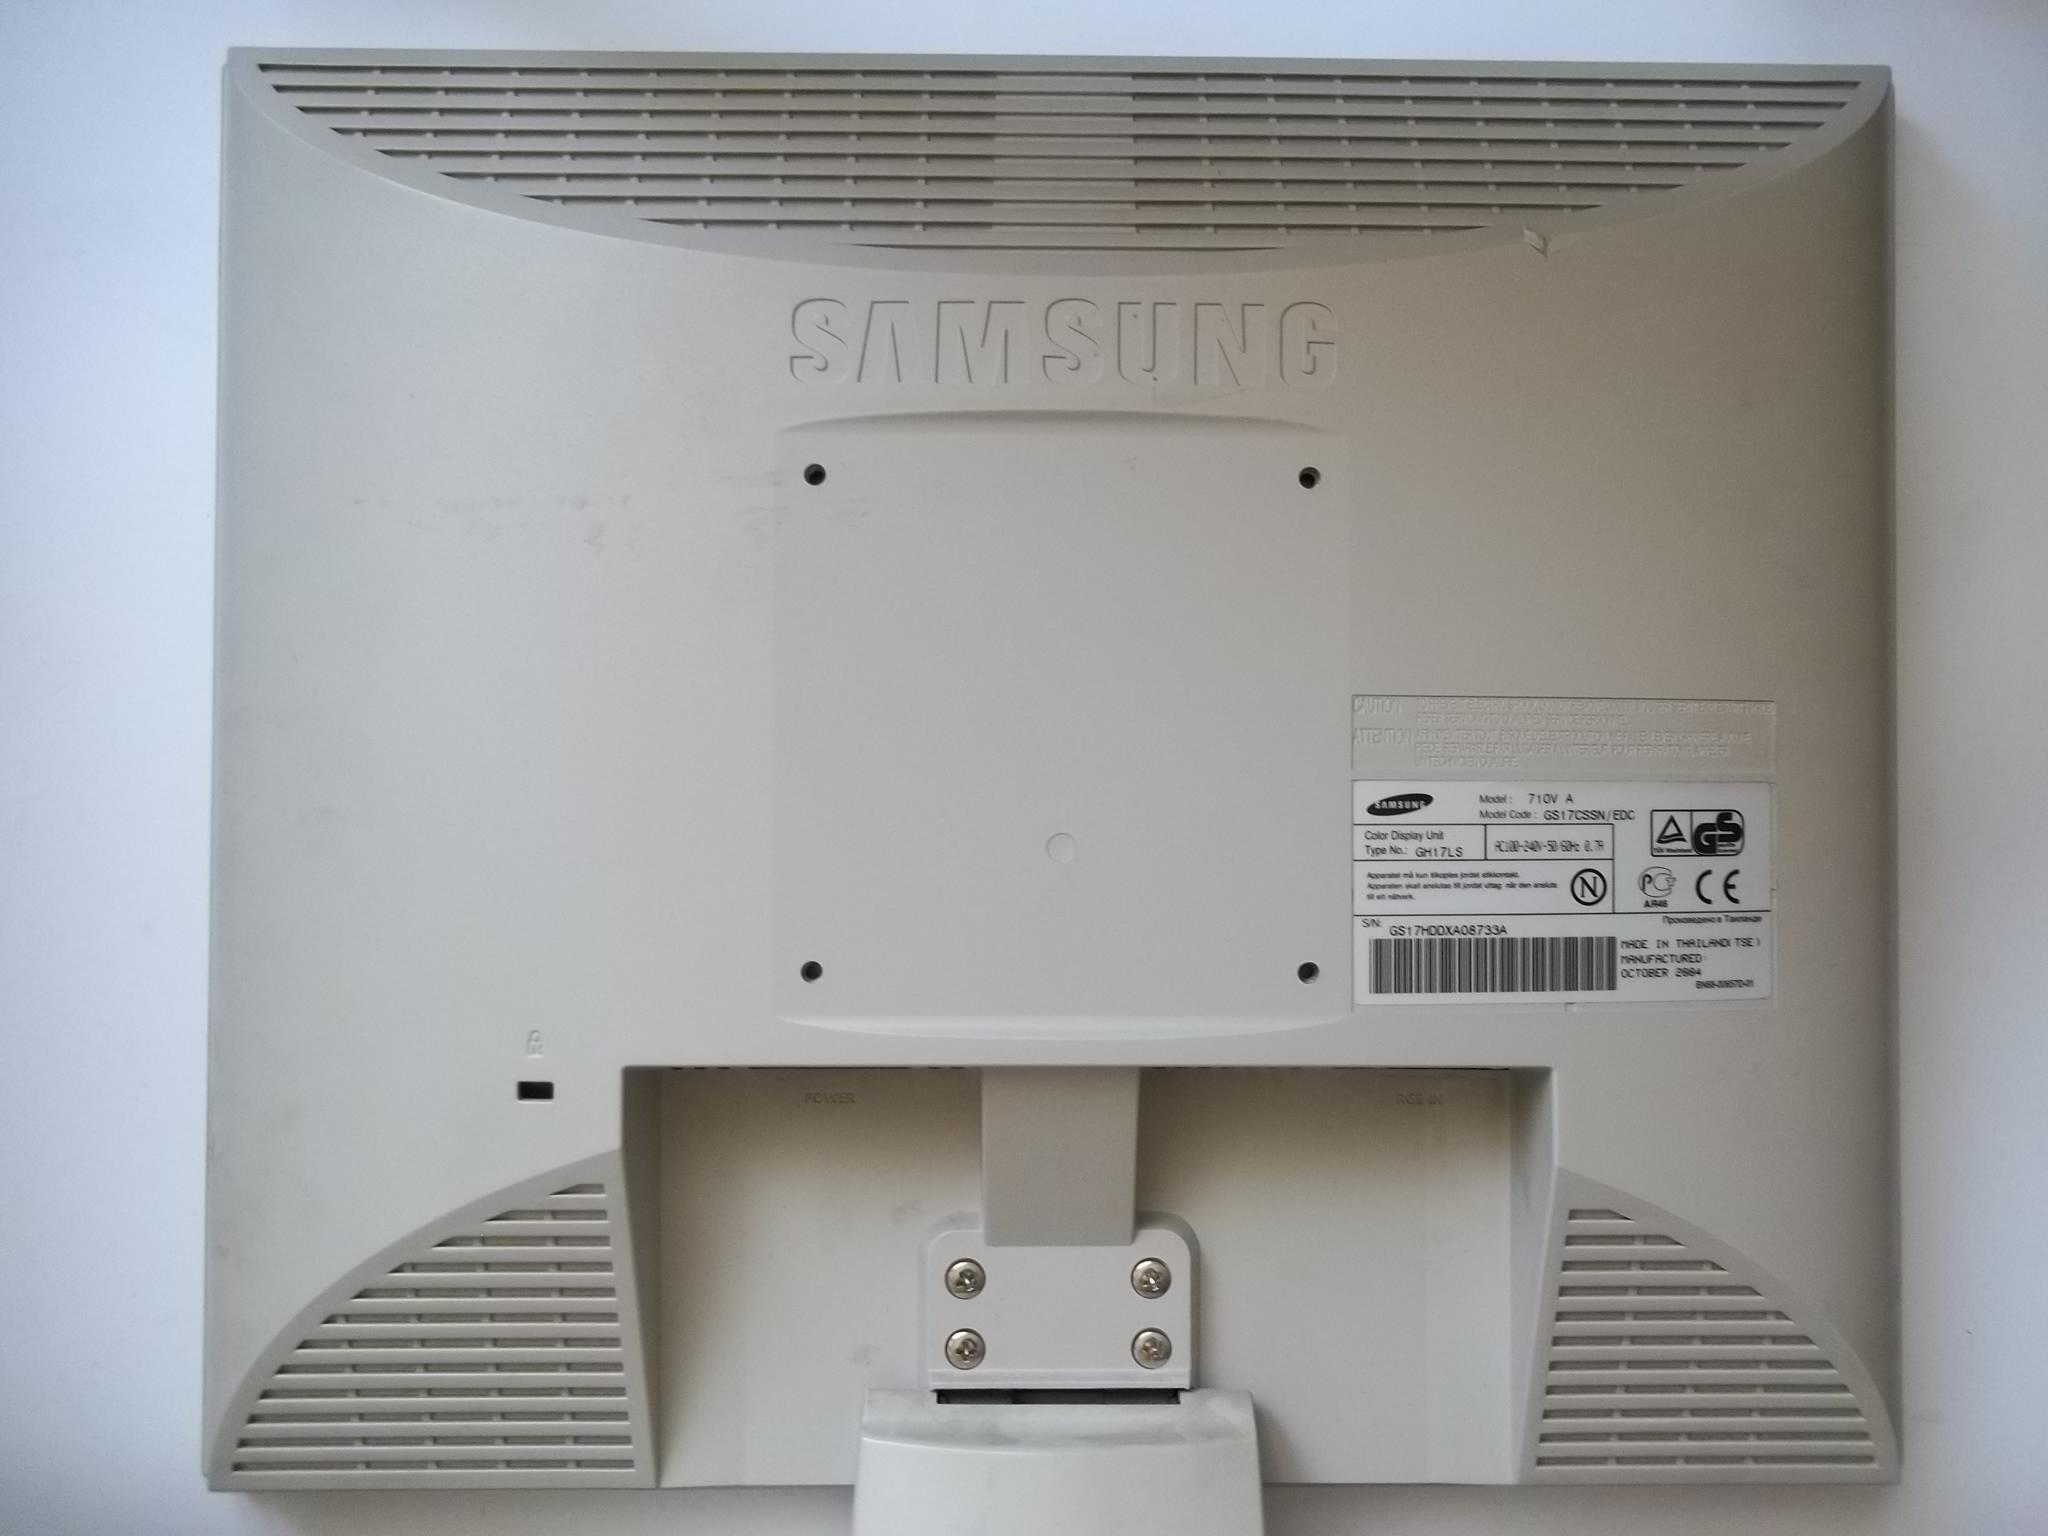 схема блока питания монитора syncmaster 710n